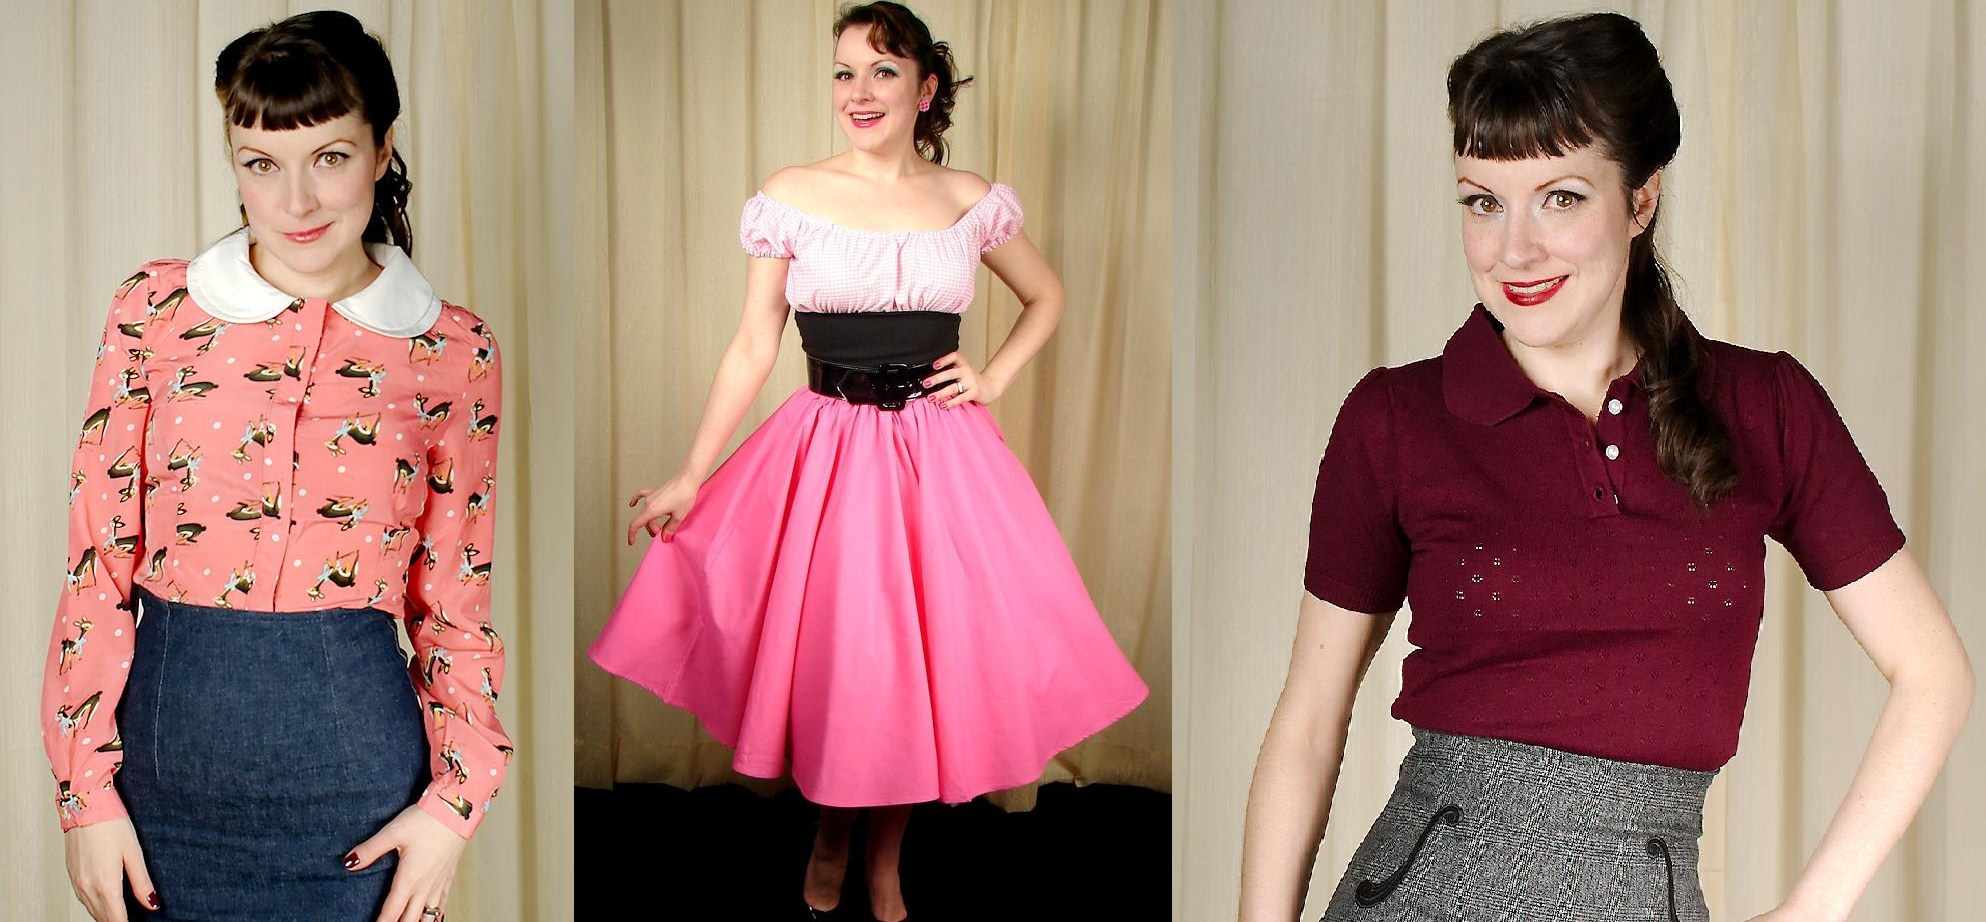 Gisela Bambi Blouse, Pink Full Circle Skirt, Freddy Knit Top